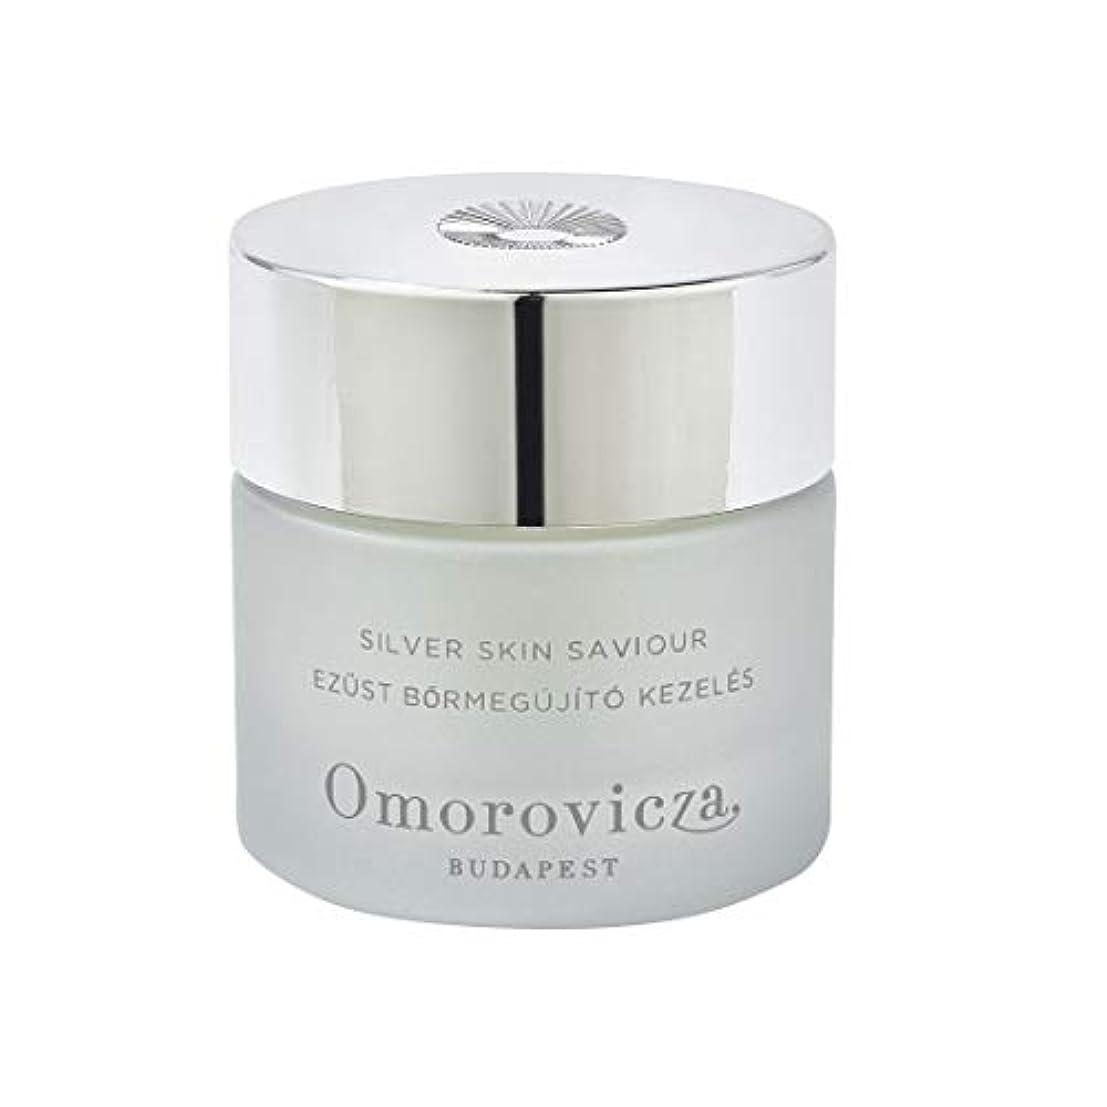 激怒狼代数的OMOROVICZA Silver Skin Saviour 50ml